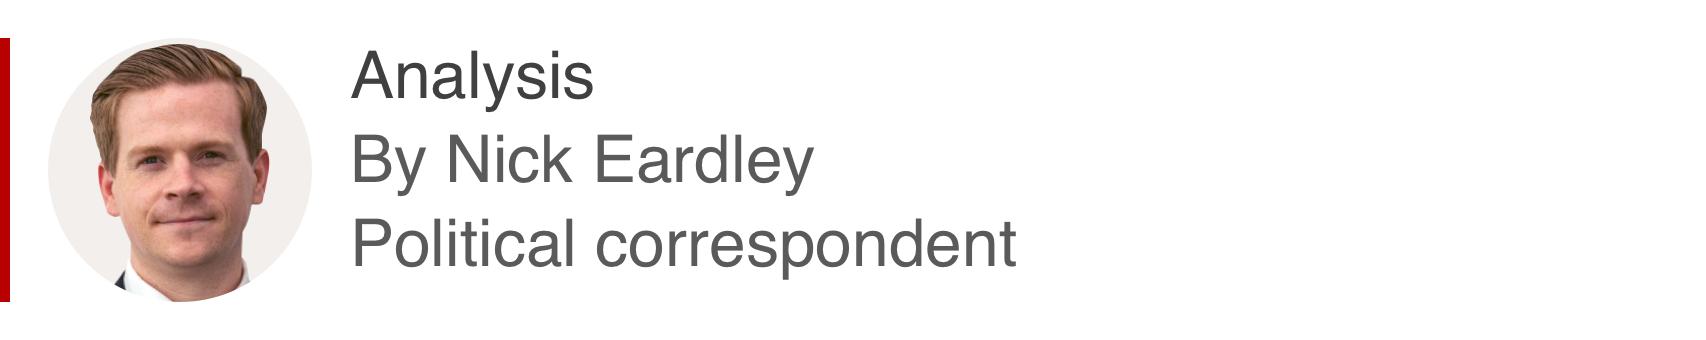 Analysis box by Nick Eardley, political correspondent